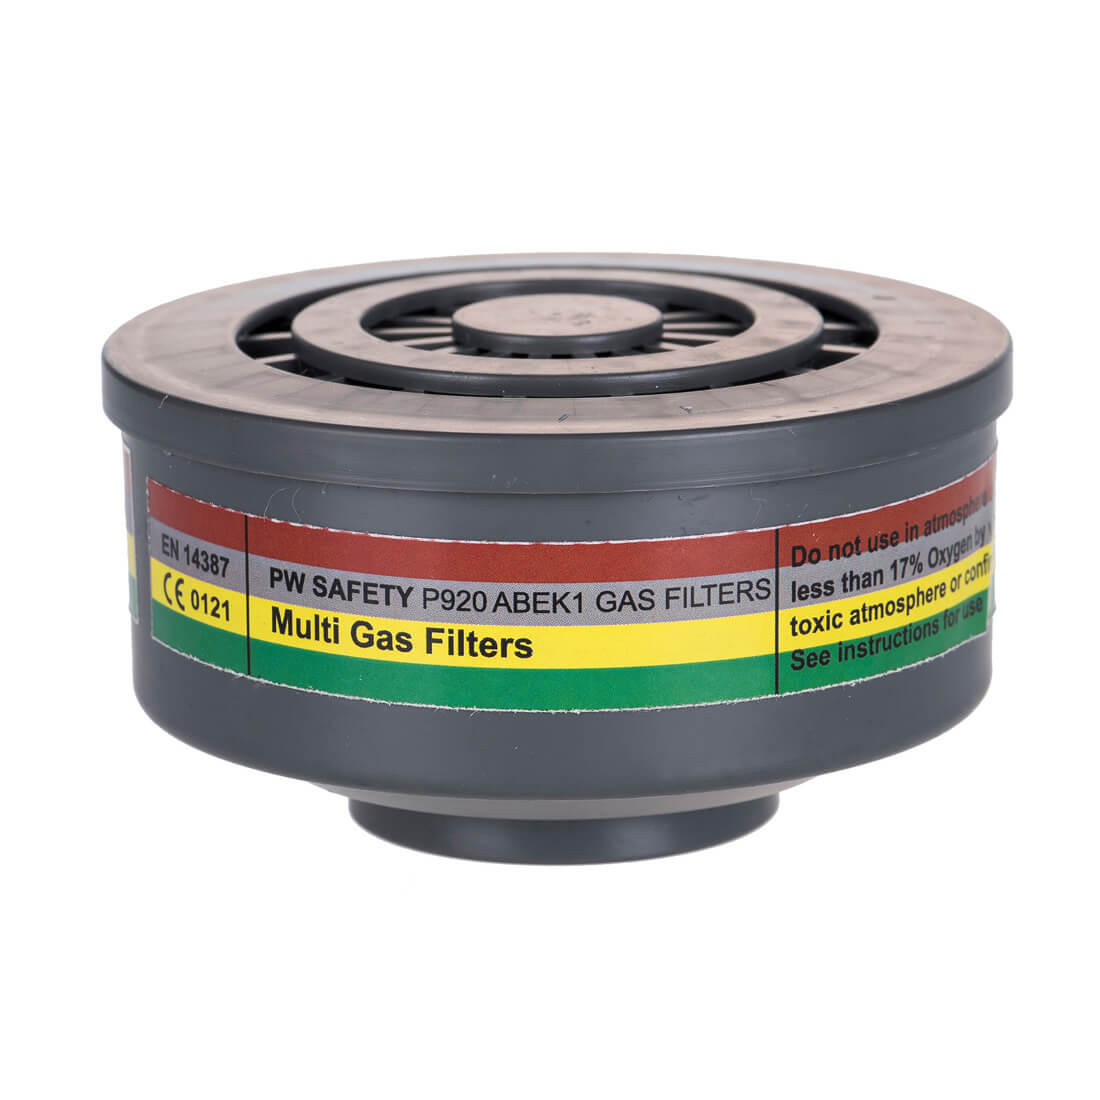 Filtru gaz ABEK1 - Echipamente de protectie personala